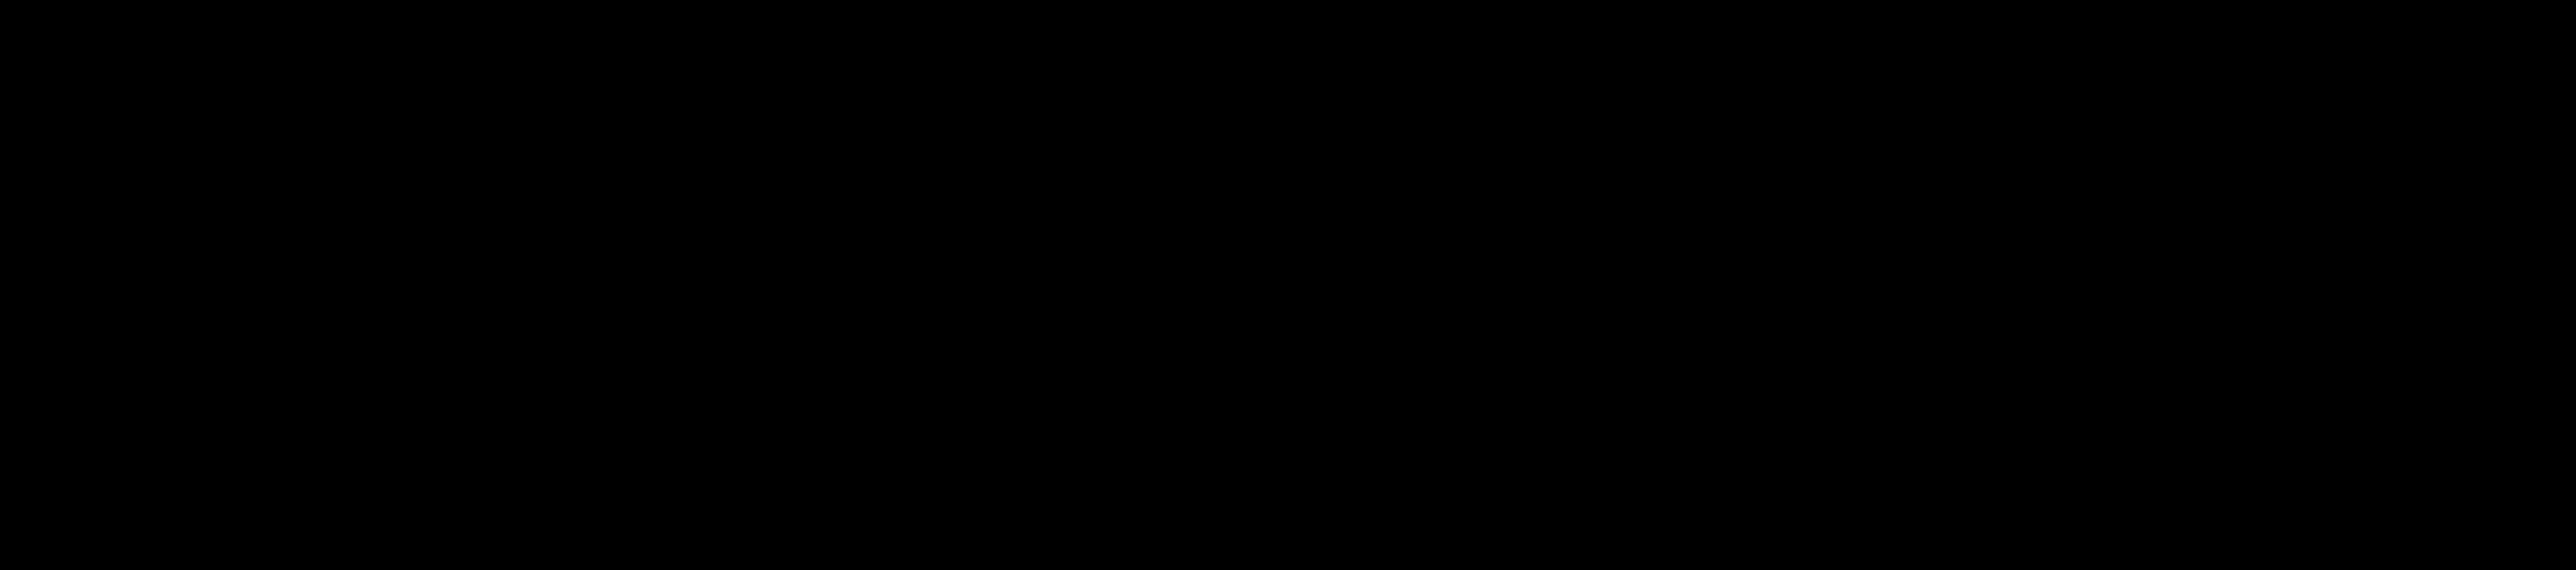 Raul Gomes Logo